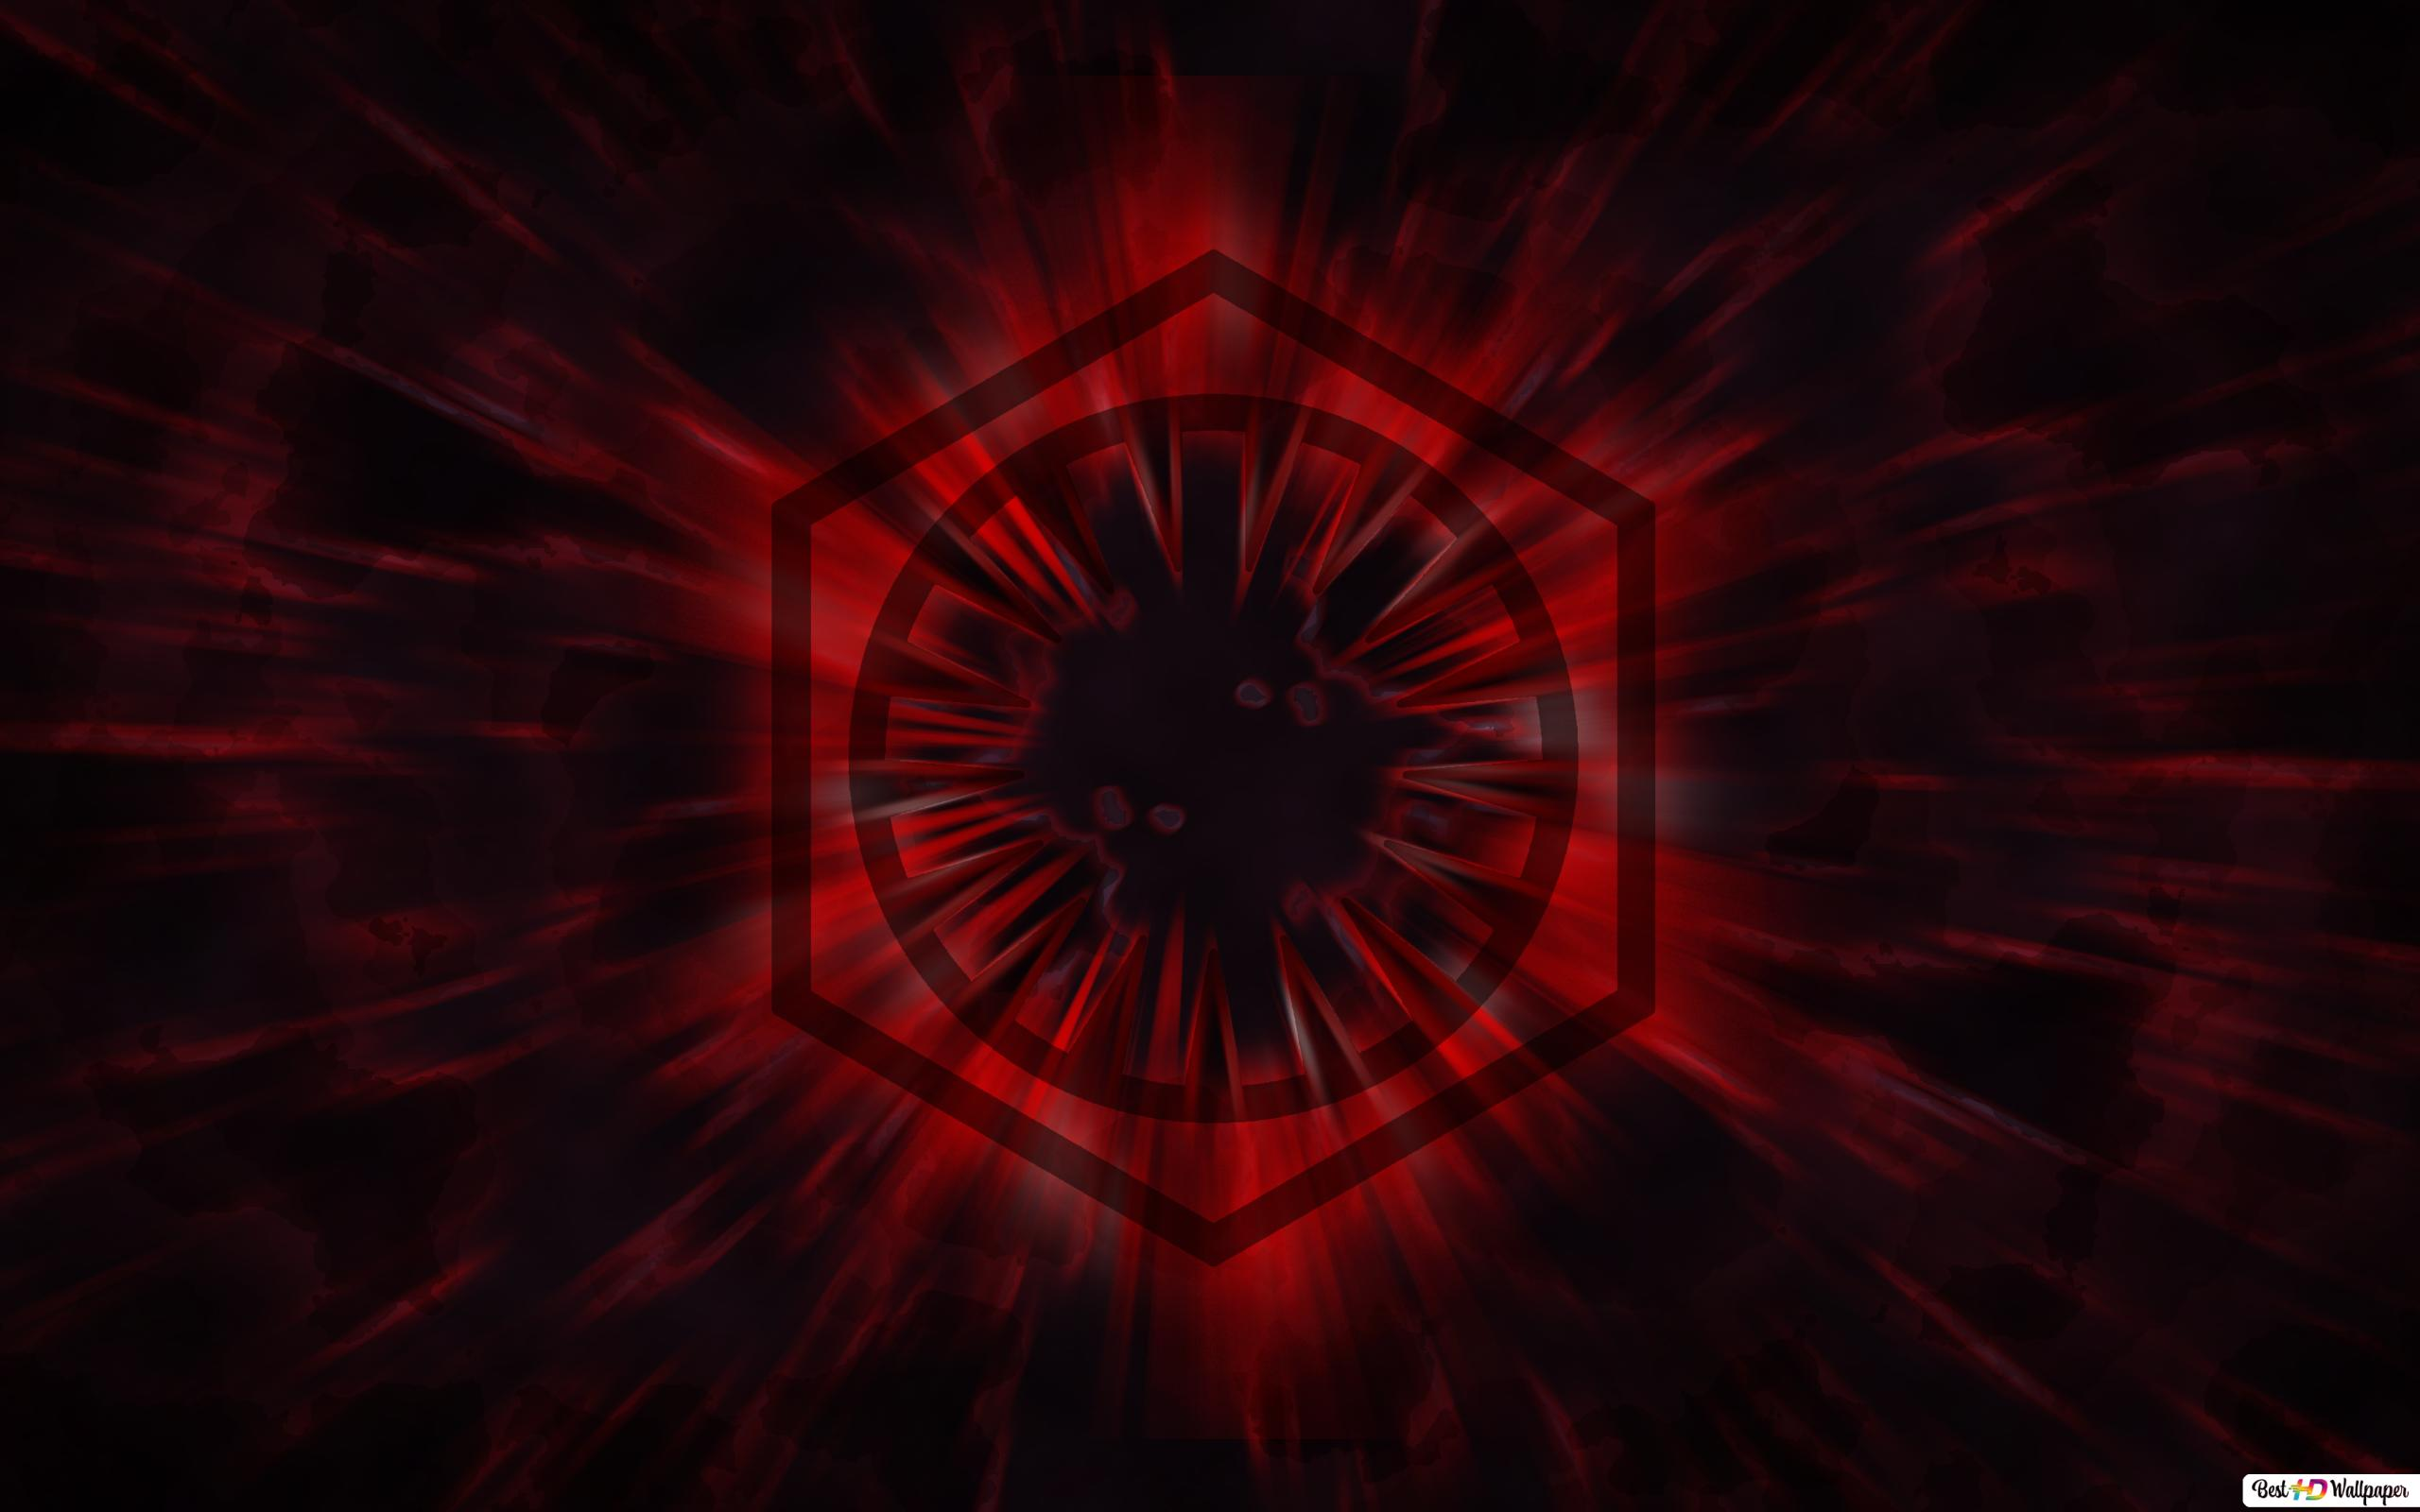 first order star wars wallpaper 2560x1600 2208 7